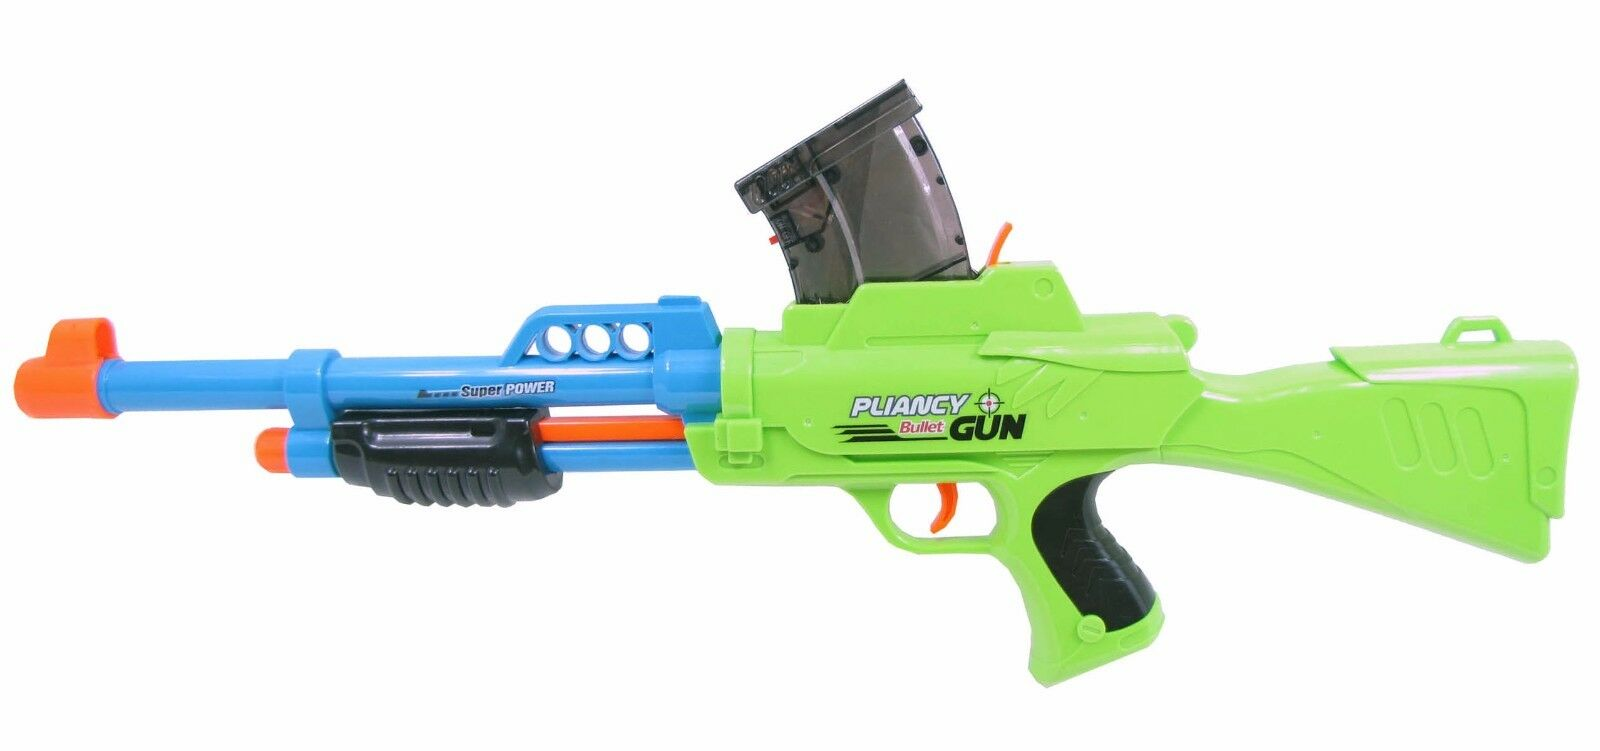 Top Top Top Pliancy 2-in-1 Soft & Water Gun Bullet Toy Rifle f9ff30